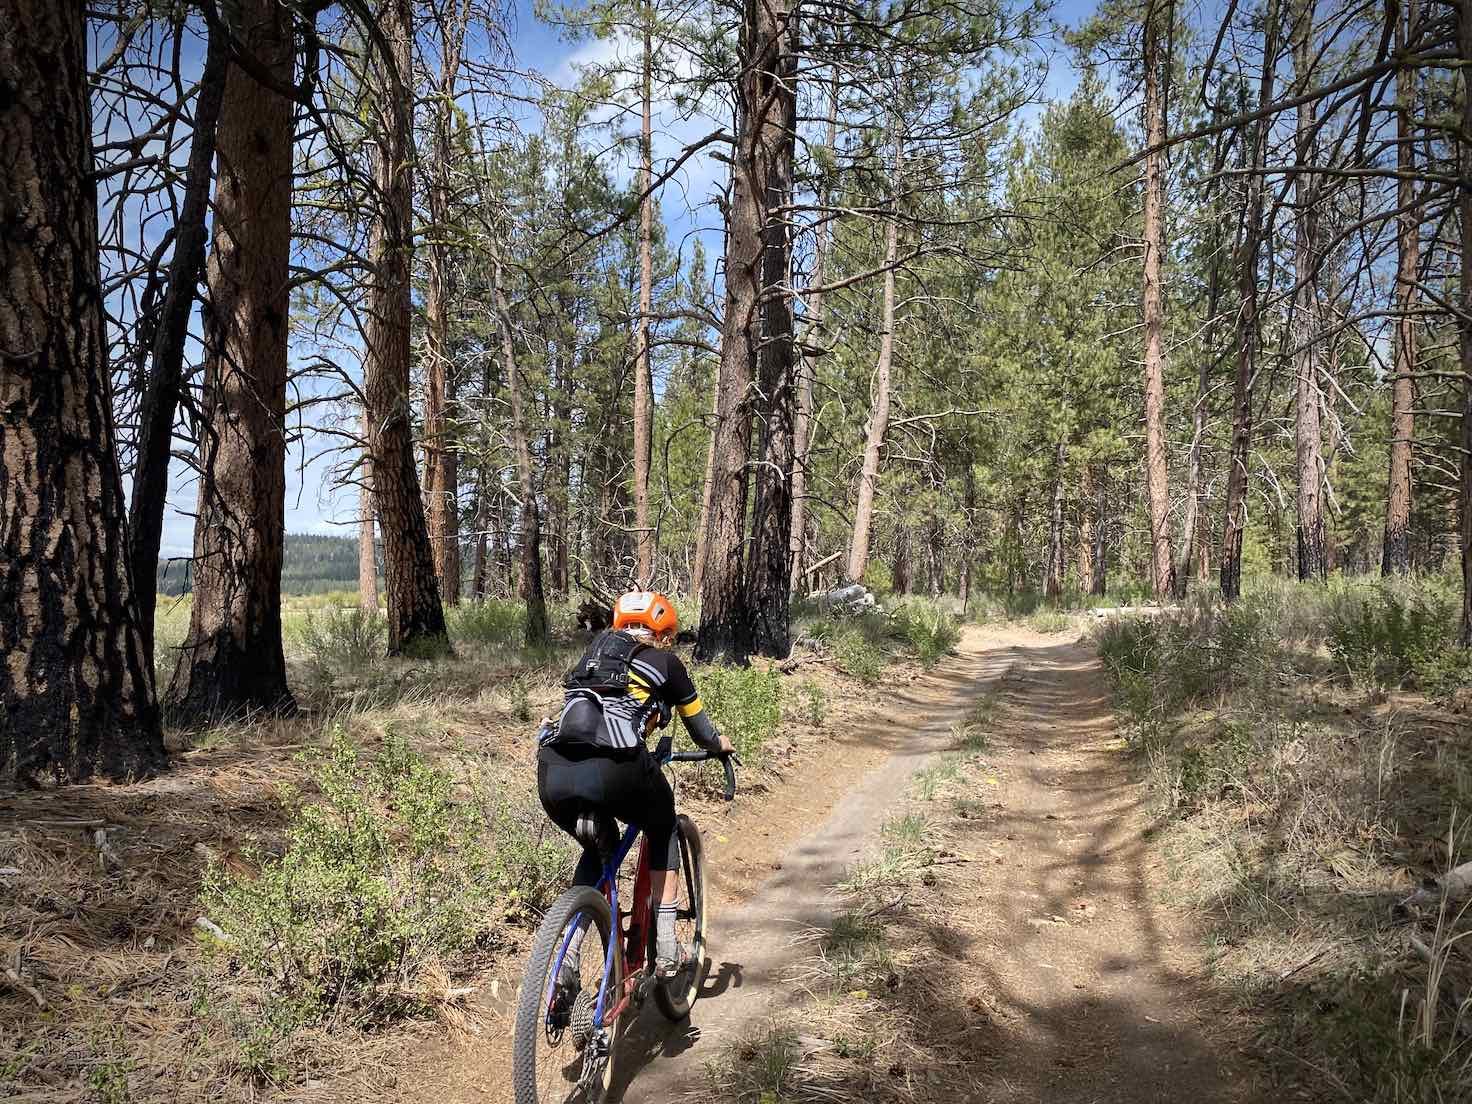 Gravel Girl cycling between big Ponderosa trees.